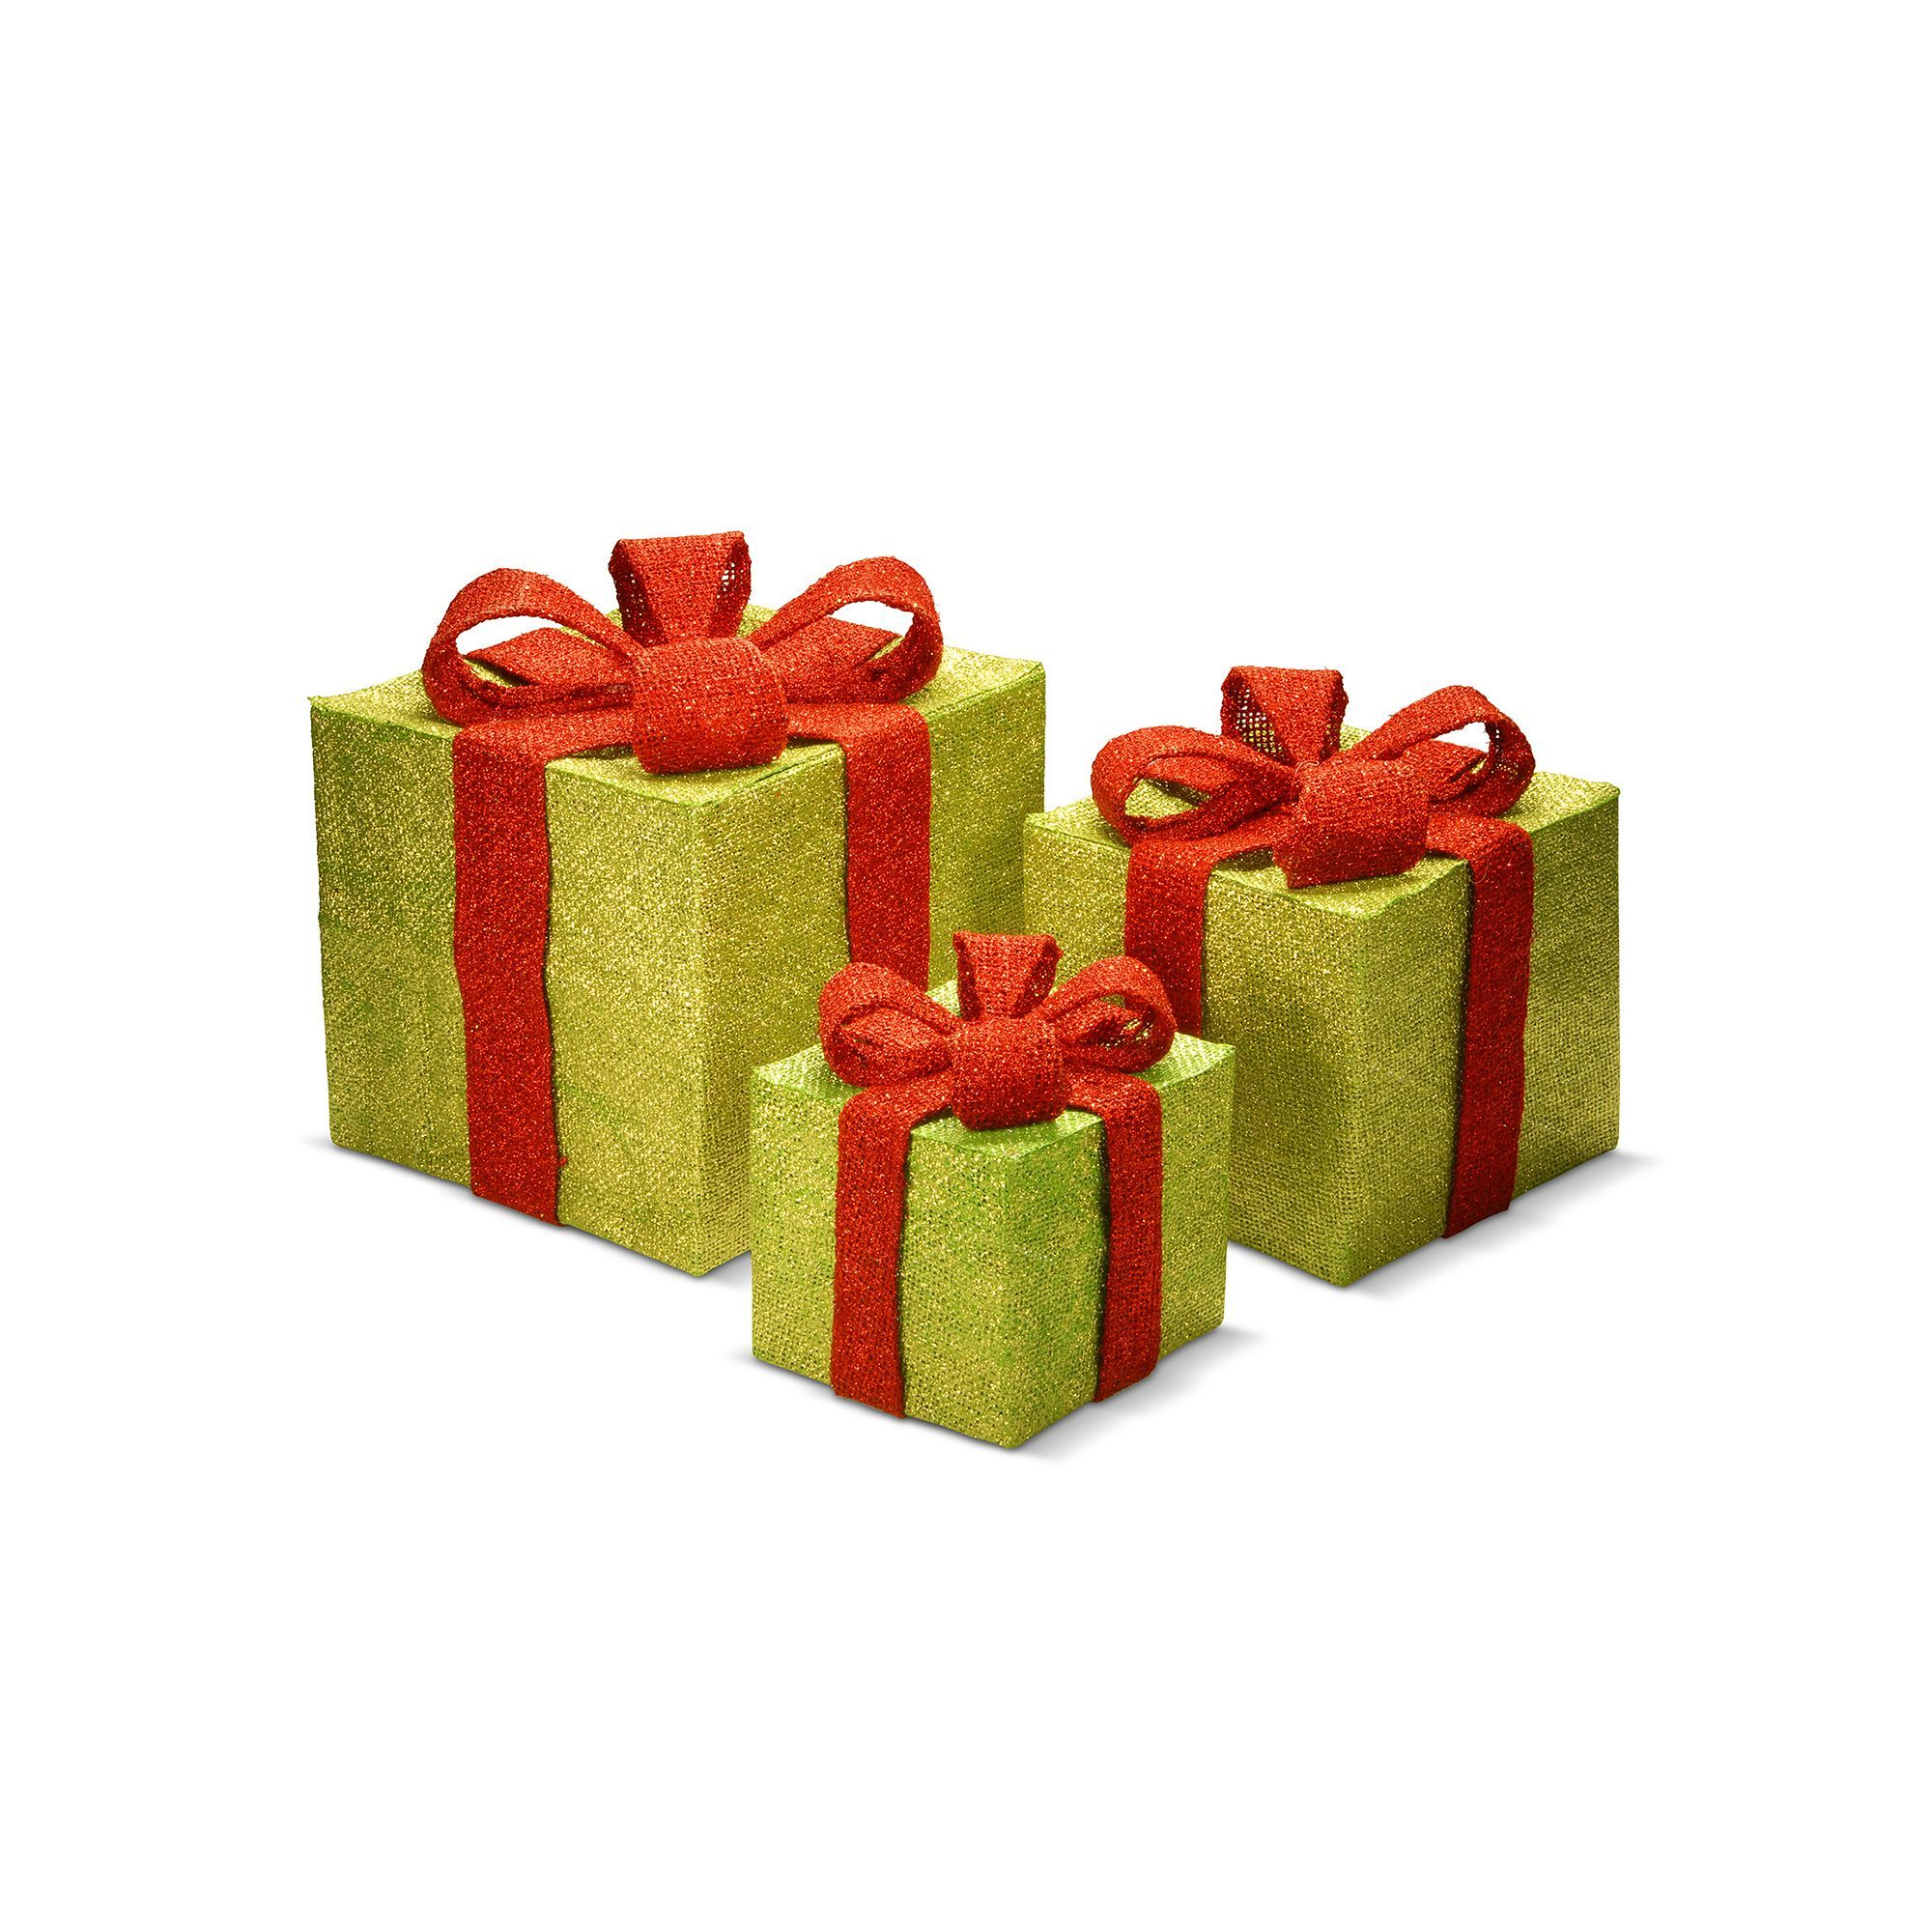 National Tree Company Gift Box Christmas Table Decor 3-piece Set, Multicolor